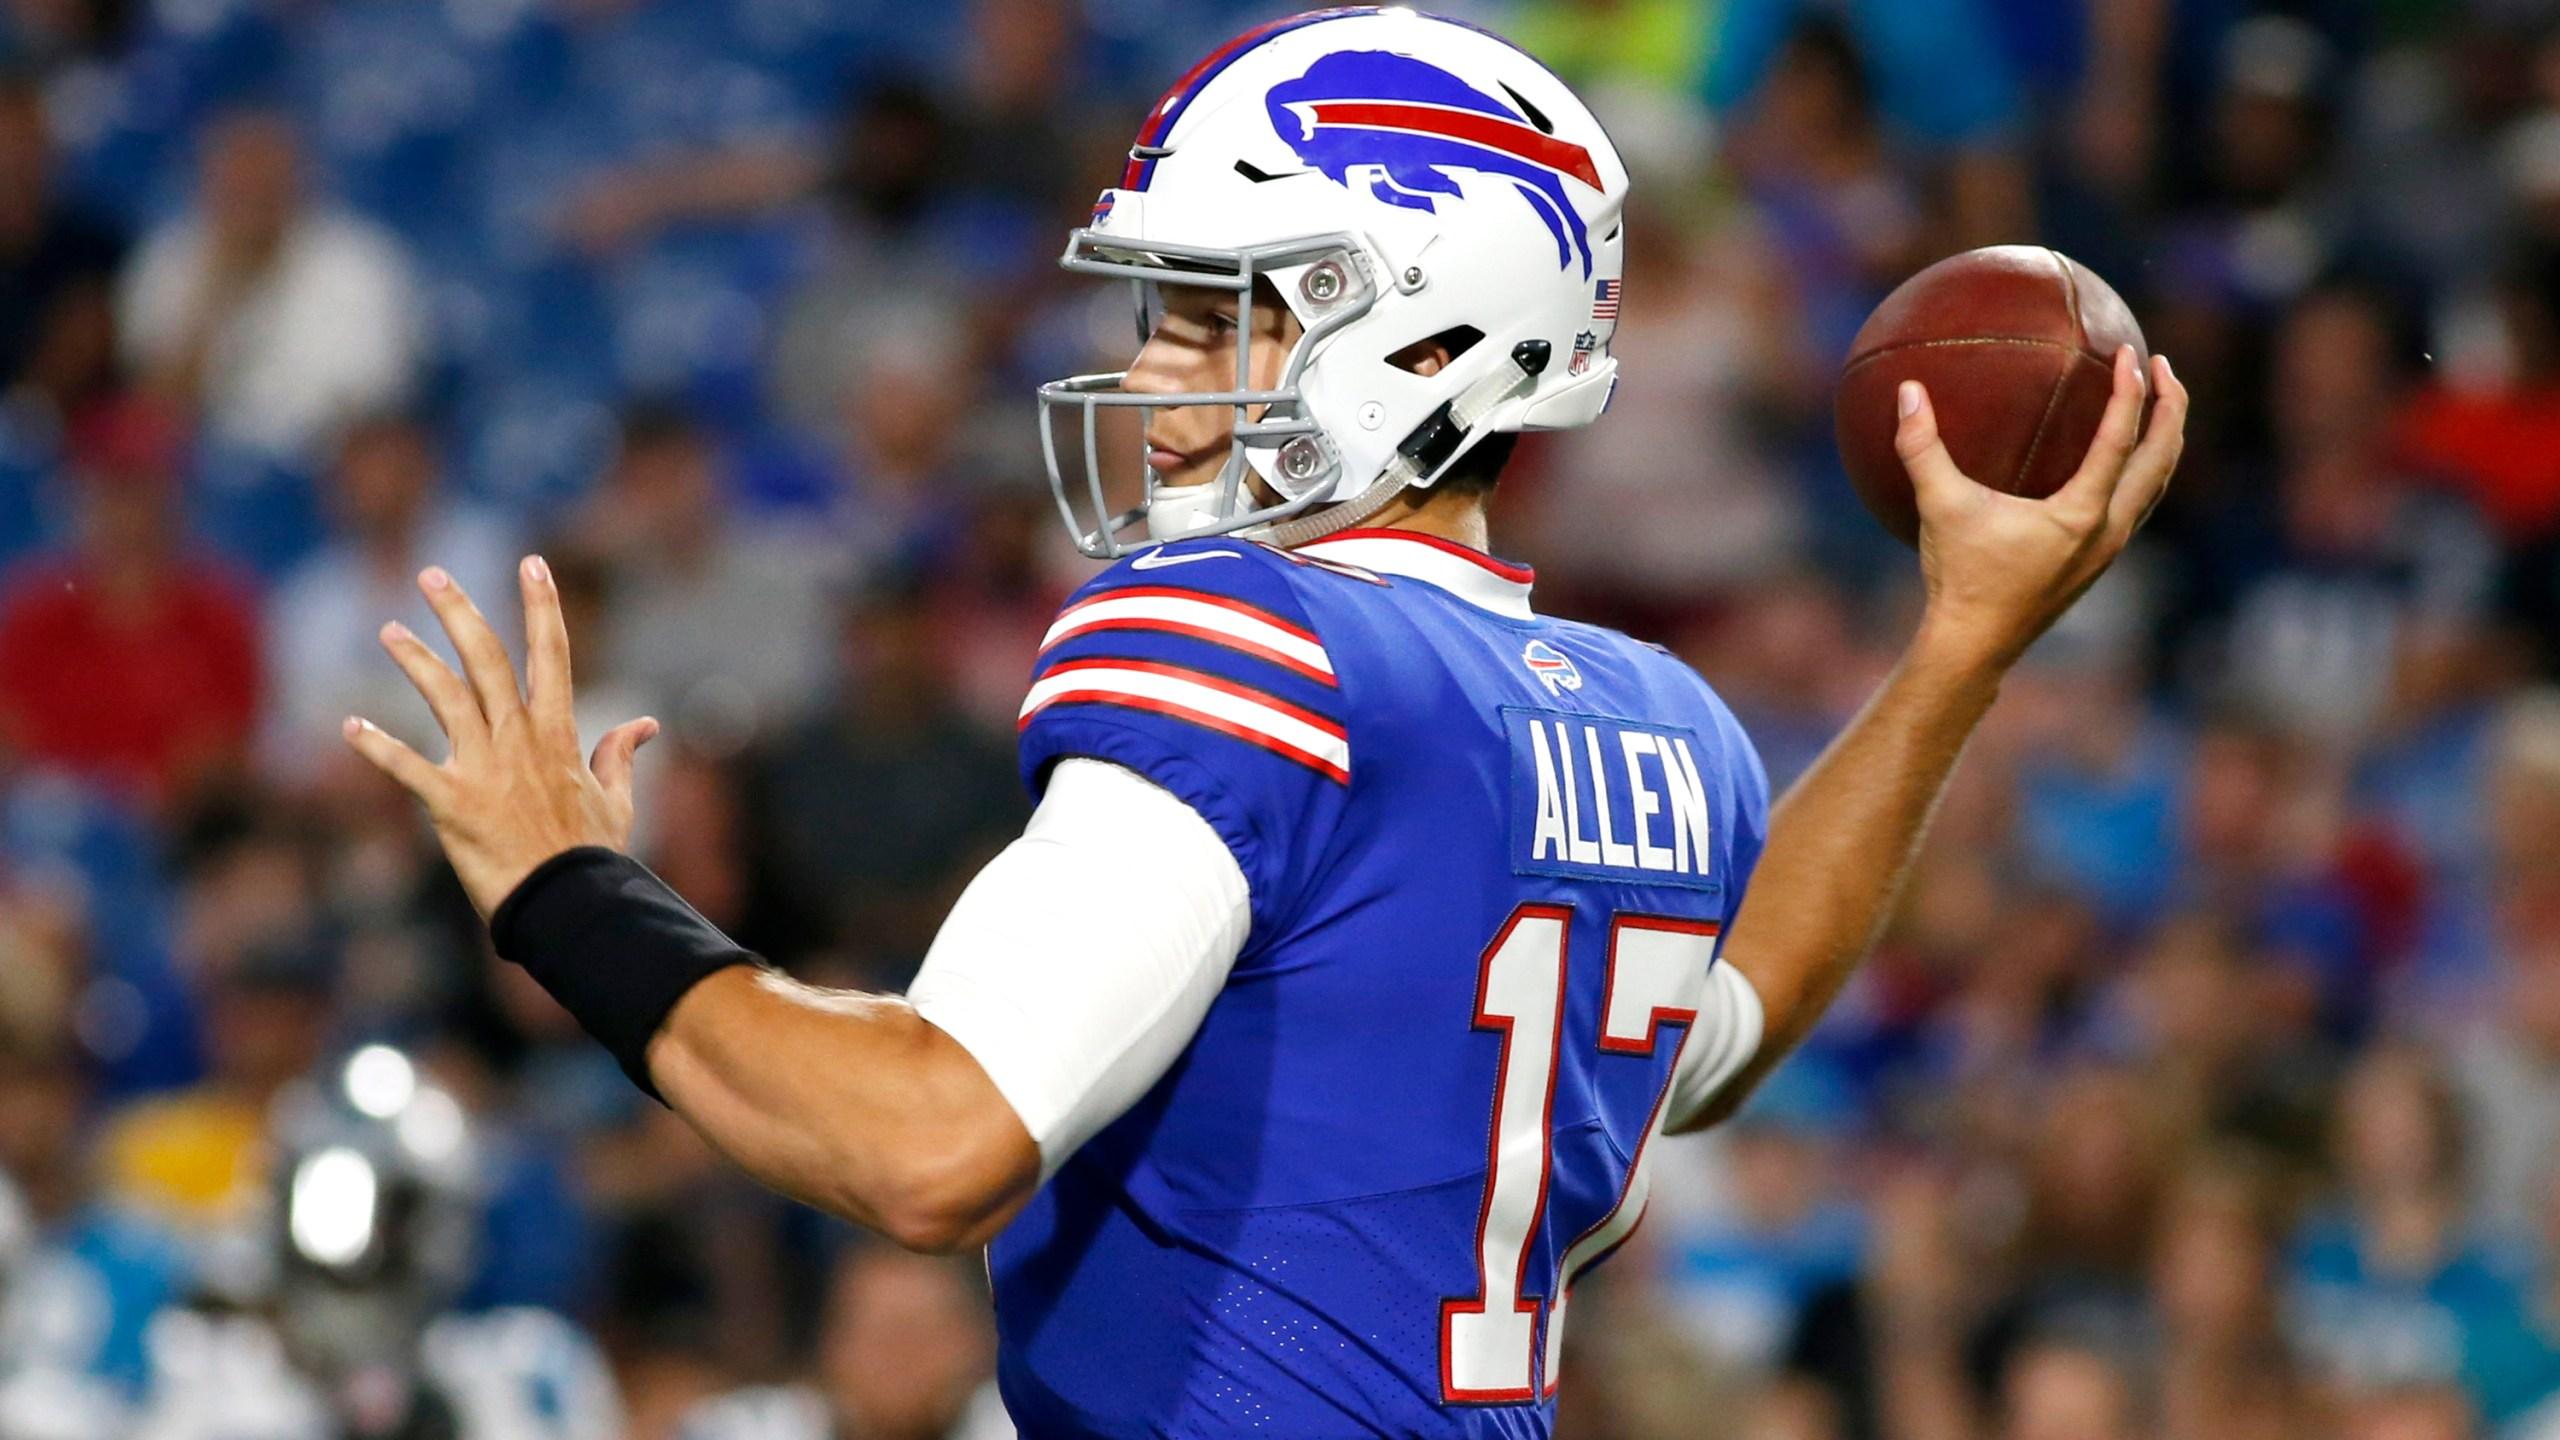 Panthers Bills Football_1533864246030